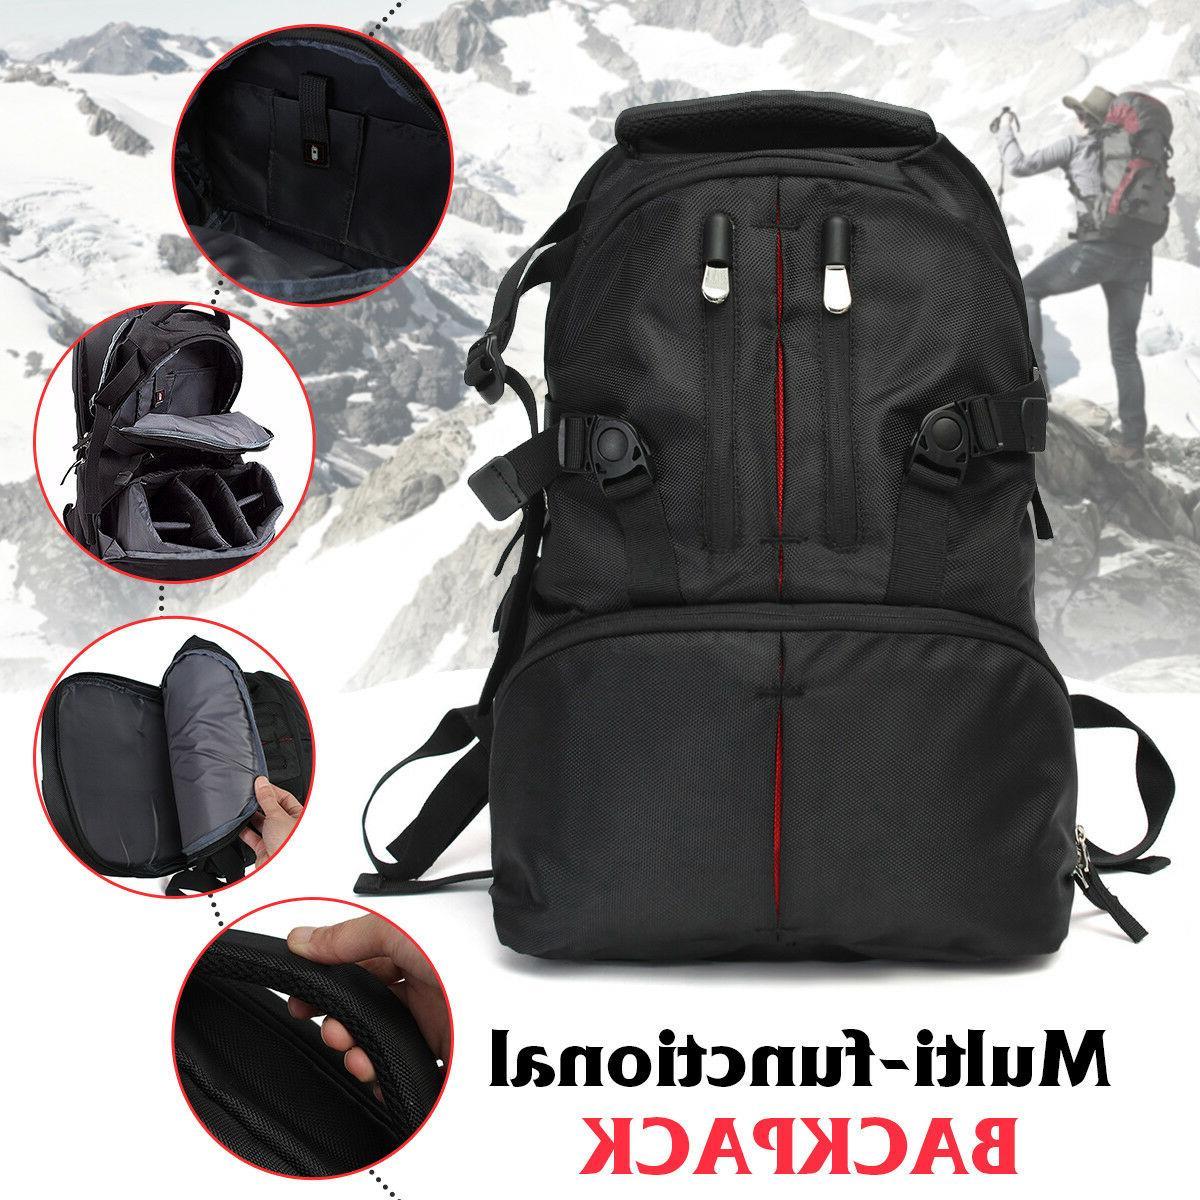 Waterproof Shockproof SLR Camera Laptop Bag Rucksack For